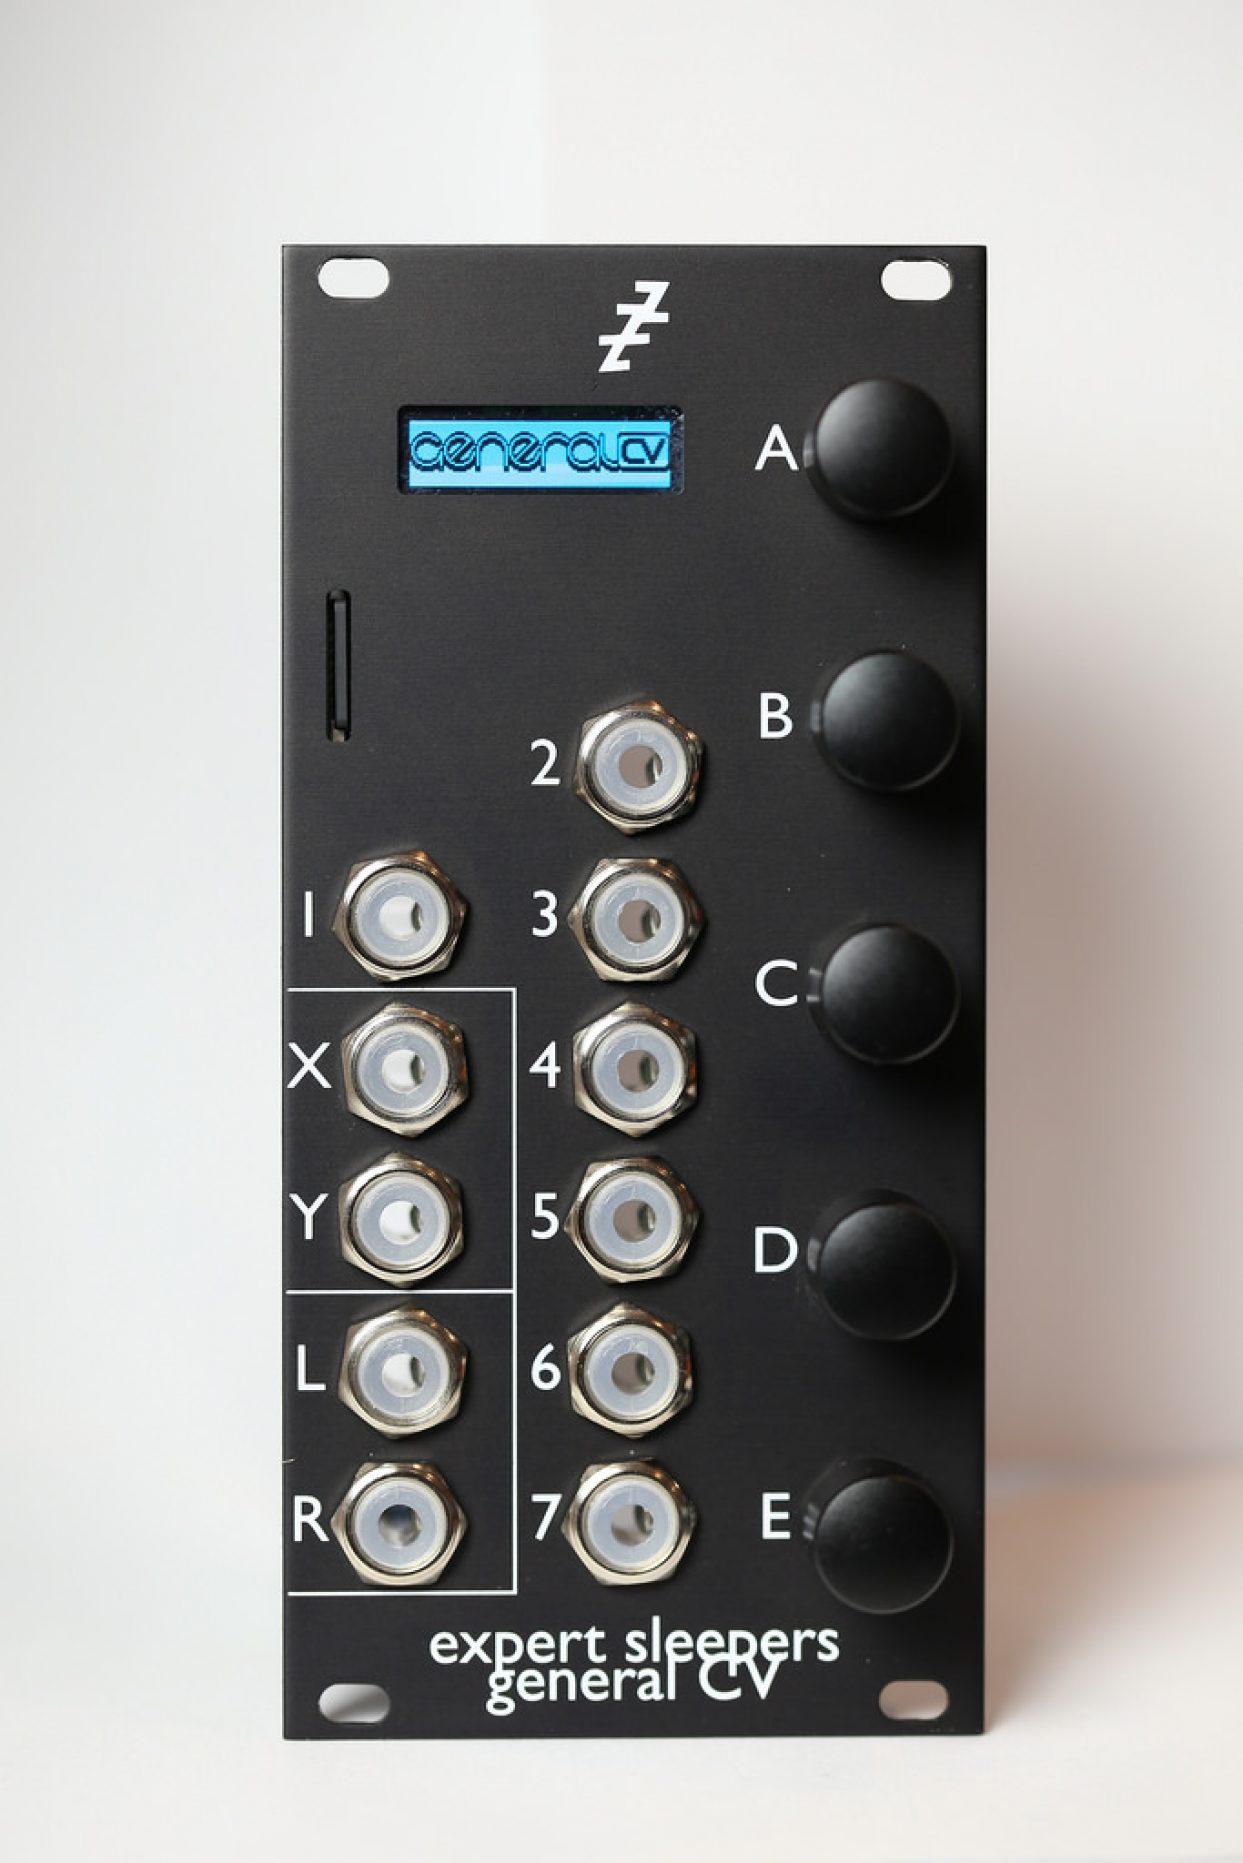 Expert Sleepers get General MIDI sound set under creative CV control in elegant Eurorack module